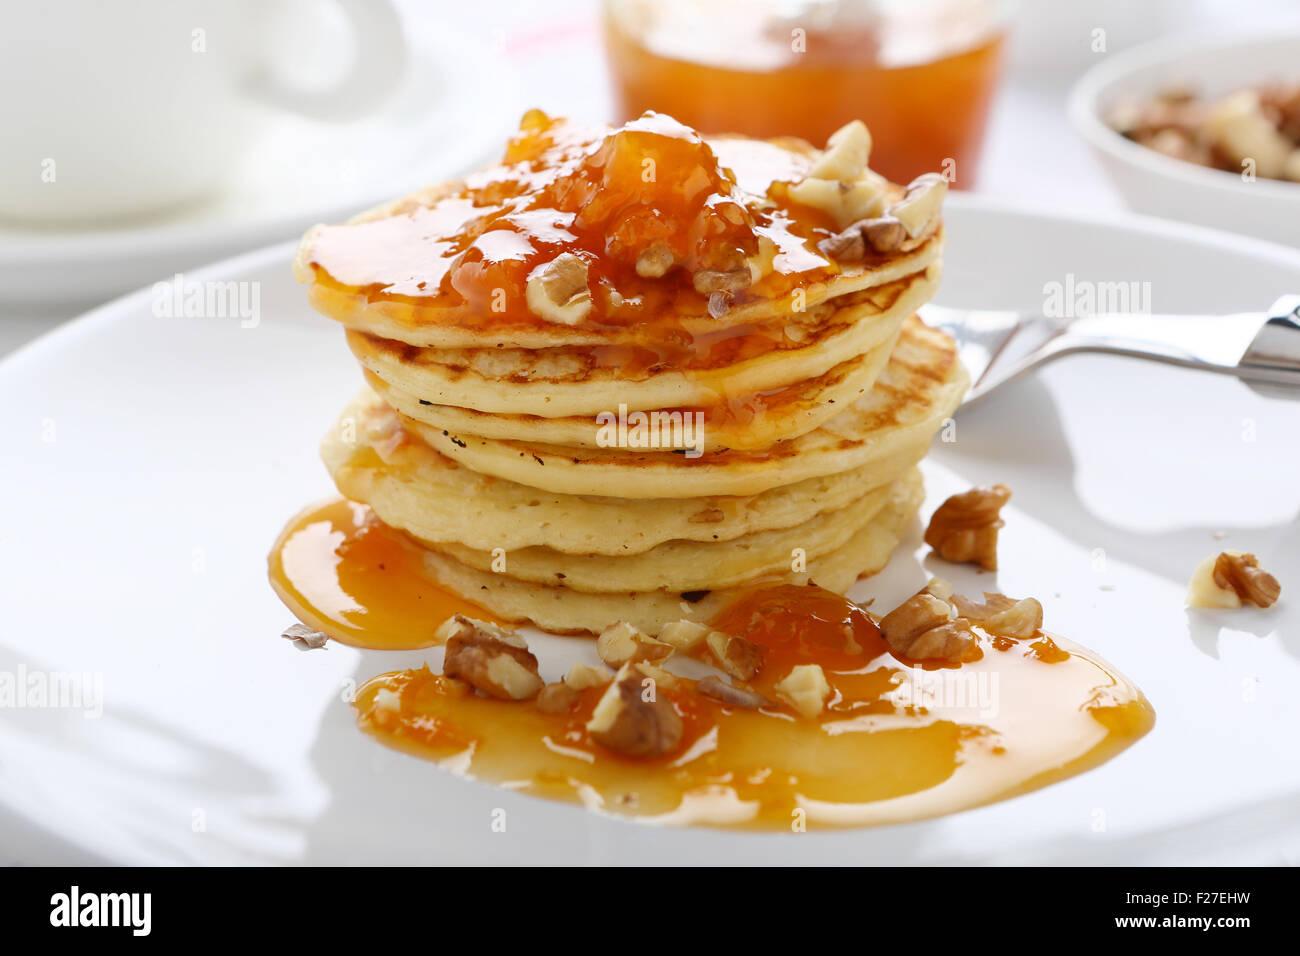 Pancakes with sweet jam, sweet dessert - Stock Image